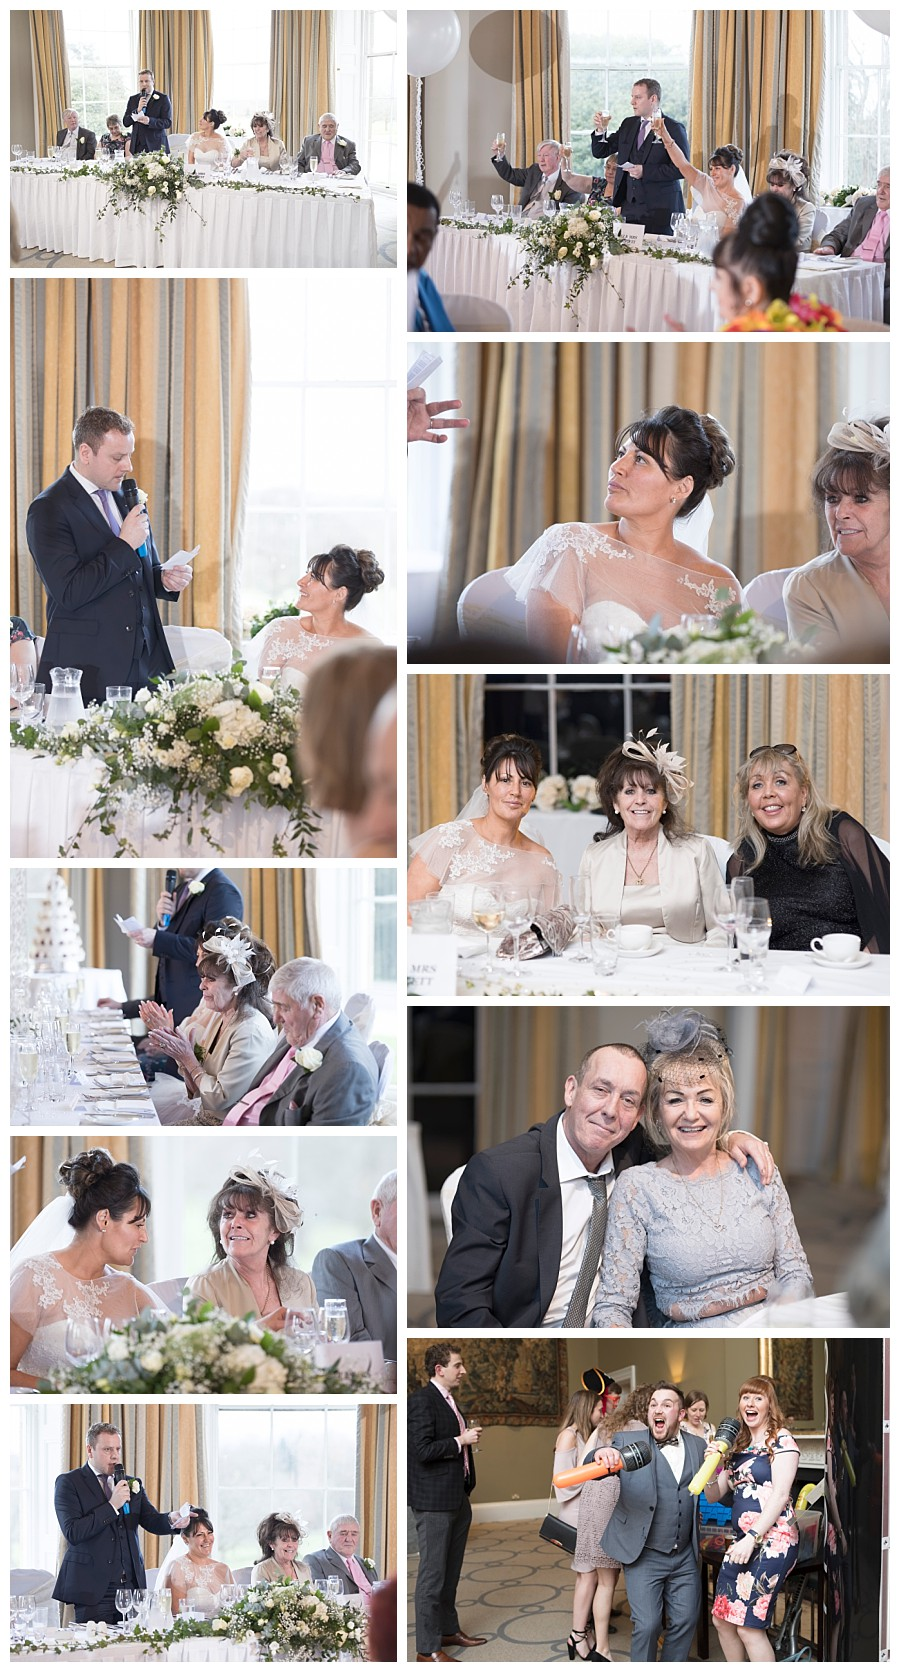 wedding reception photos rudding park hotel, speeches photos rudding park weddings, photographer Harrogate